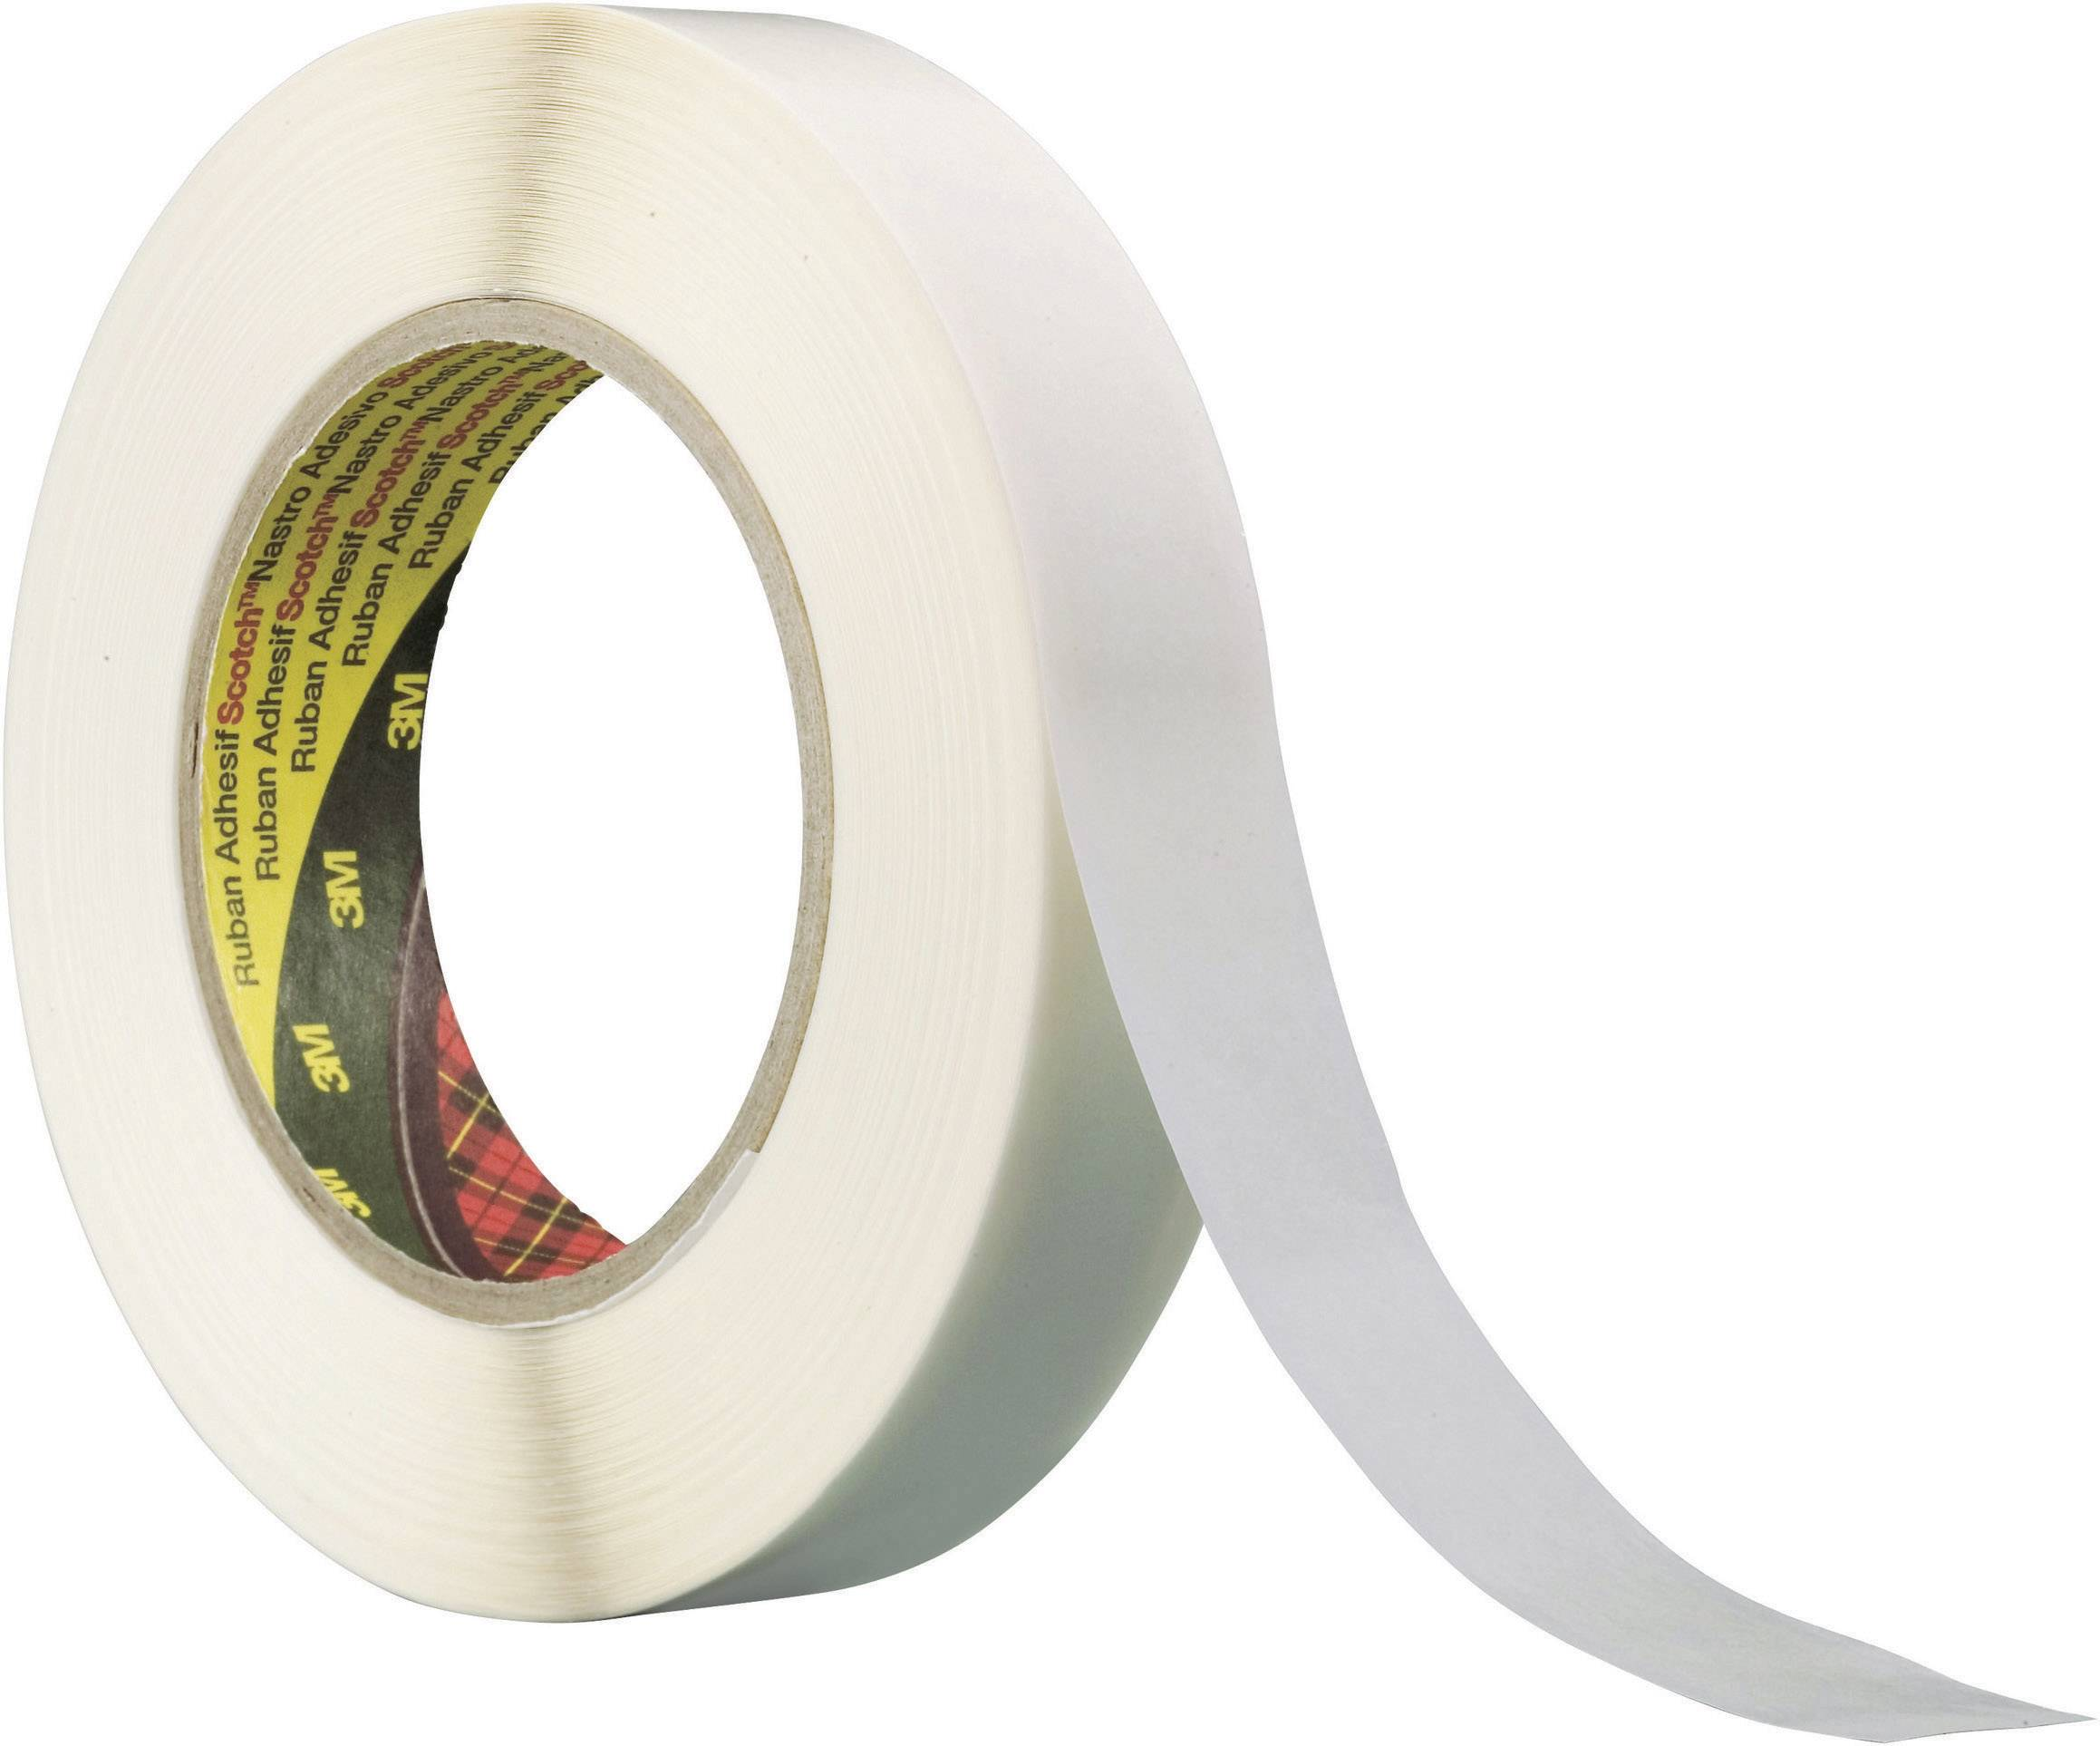 Obojstranná lepiaca páska 3M 983XL XT-0034-9005-6, (d x š) 50 m x 24 mm, krémová, 1 roliek